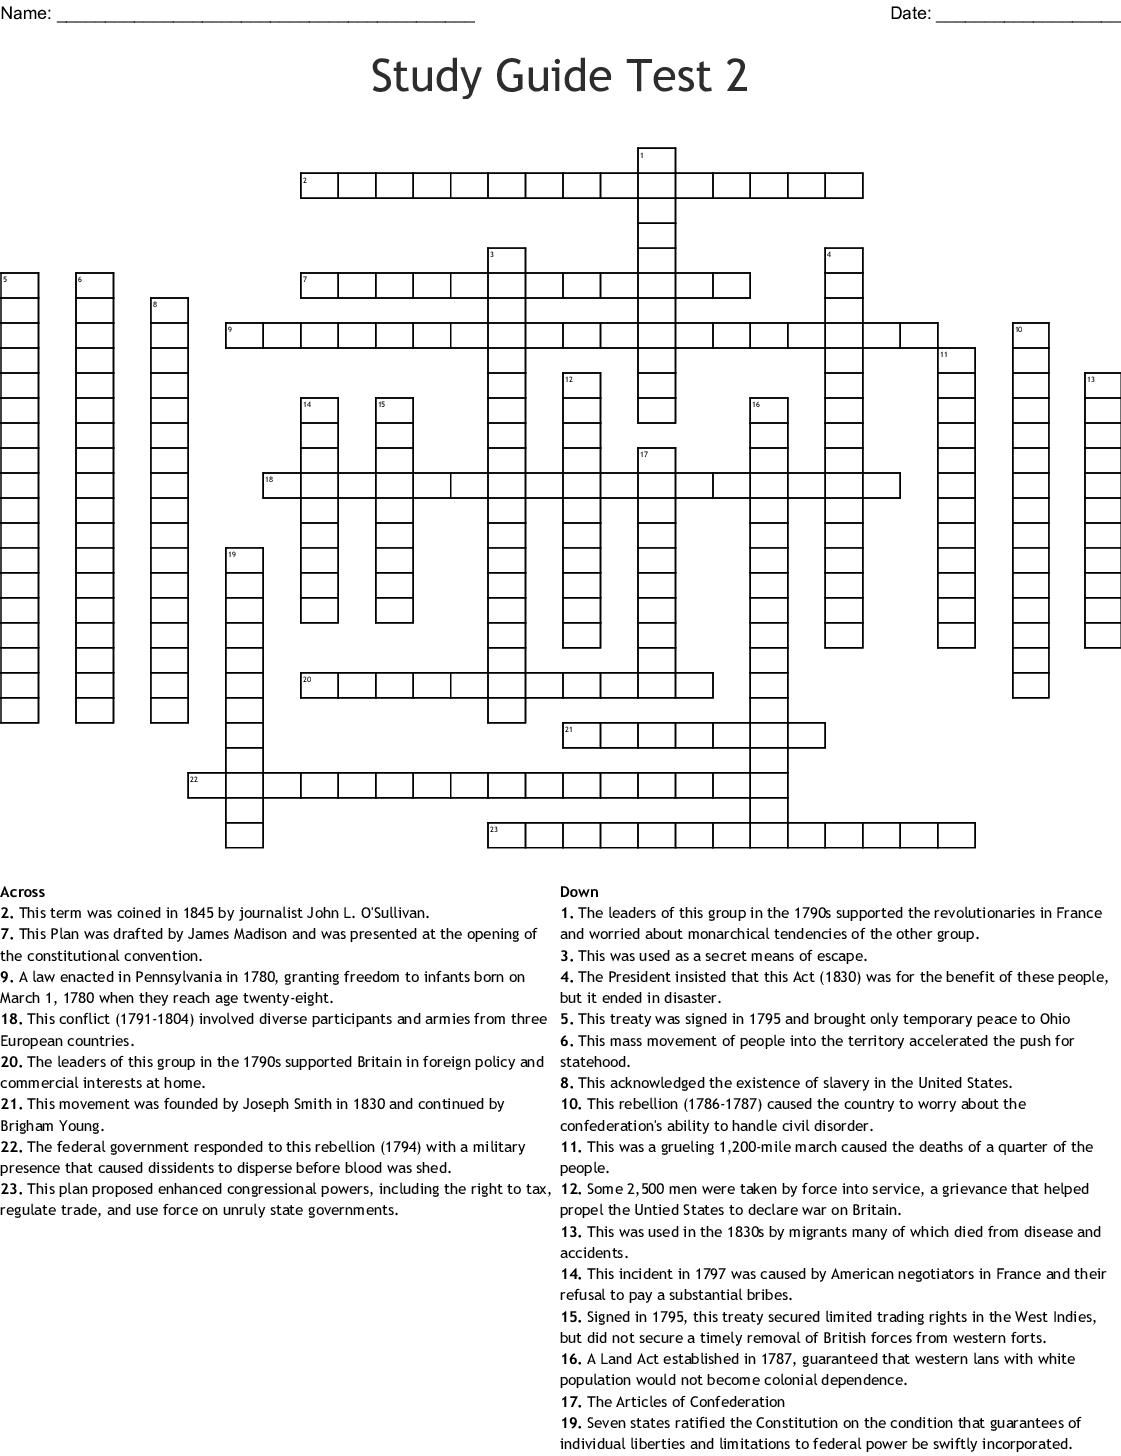 Study Guide Test 2 Crossword